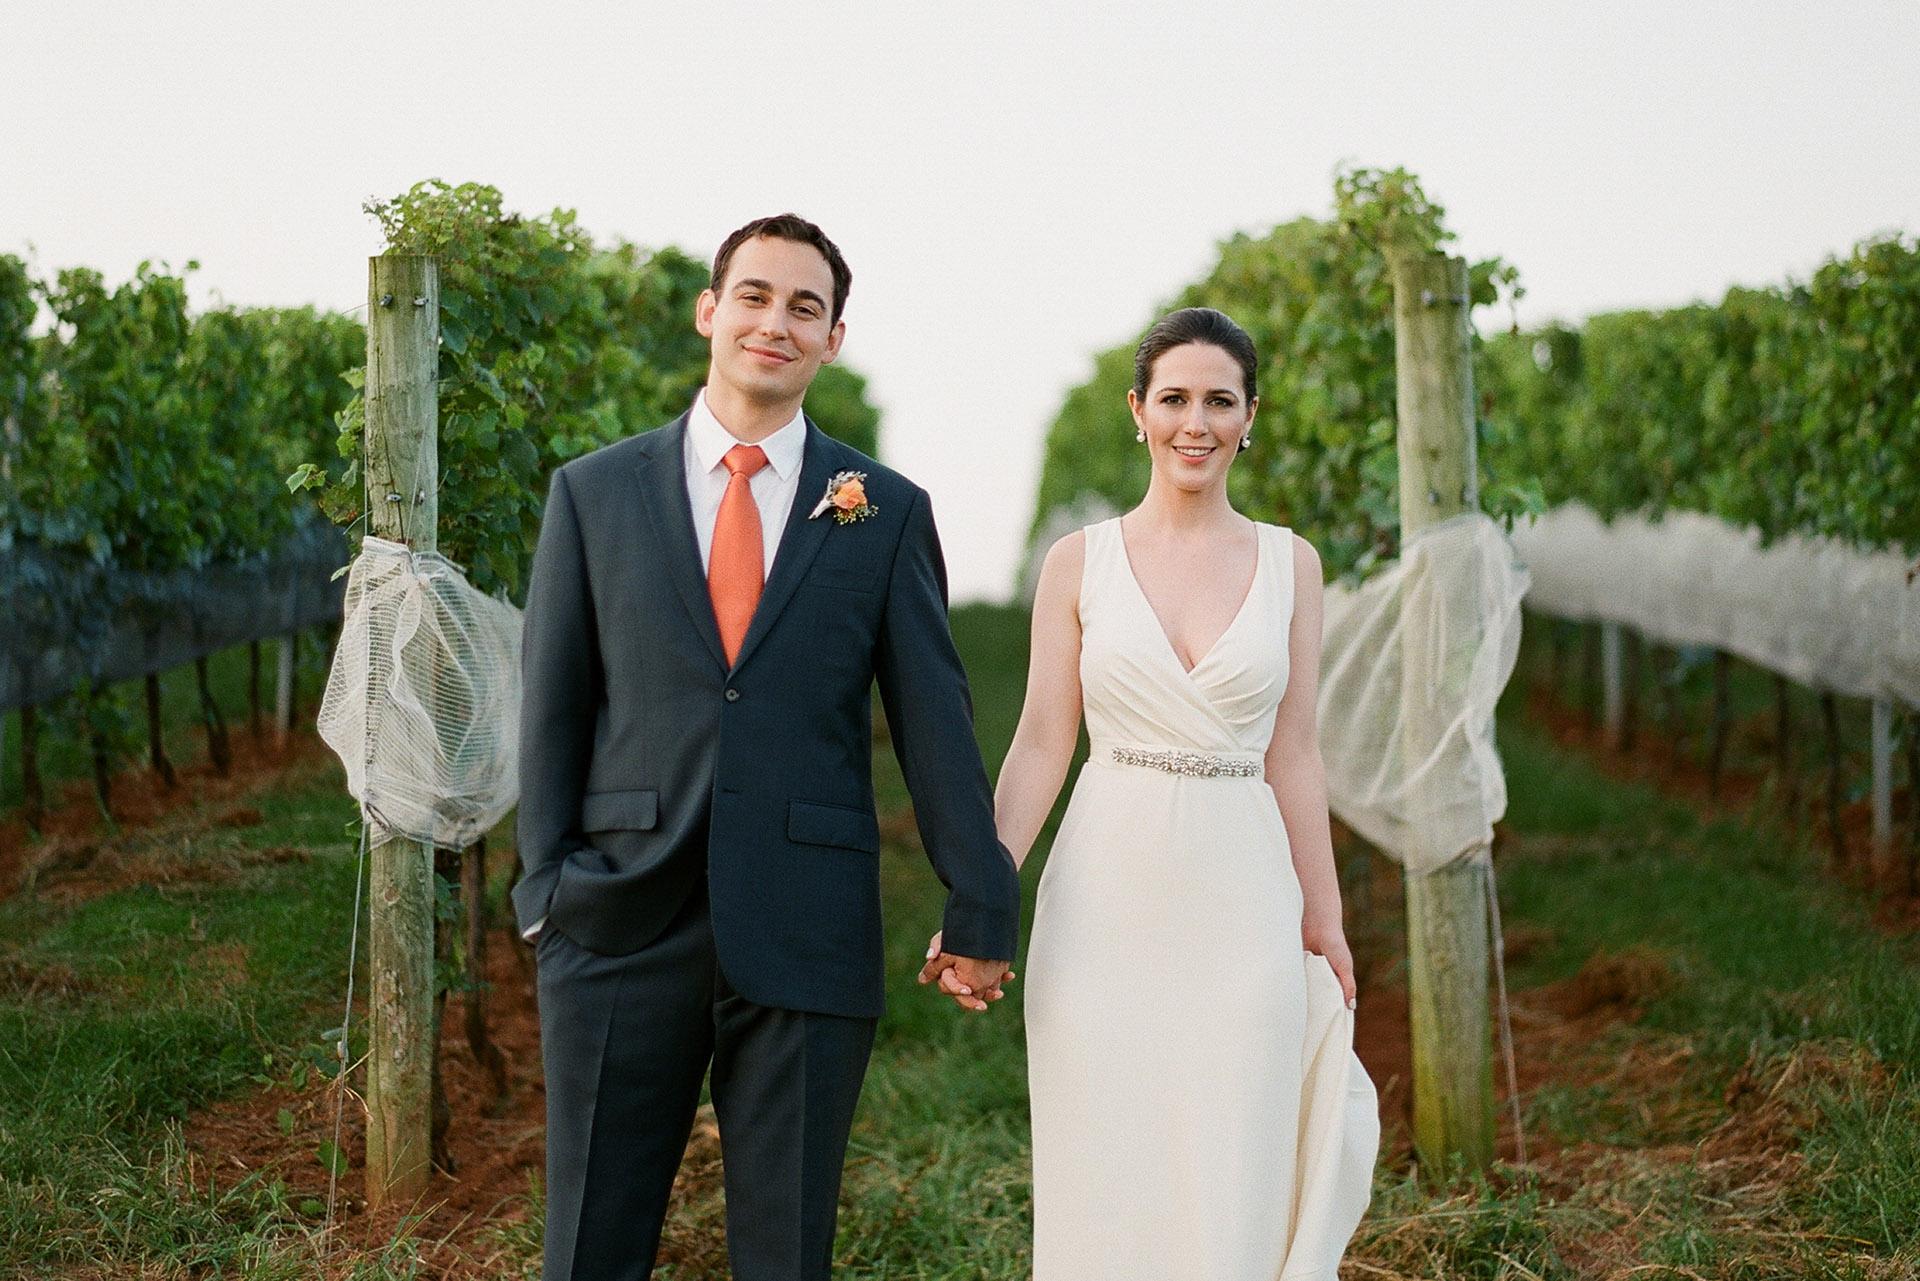 7 Wine Regions For Your Destination Wedding photo